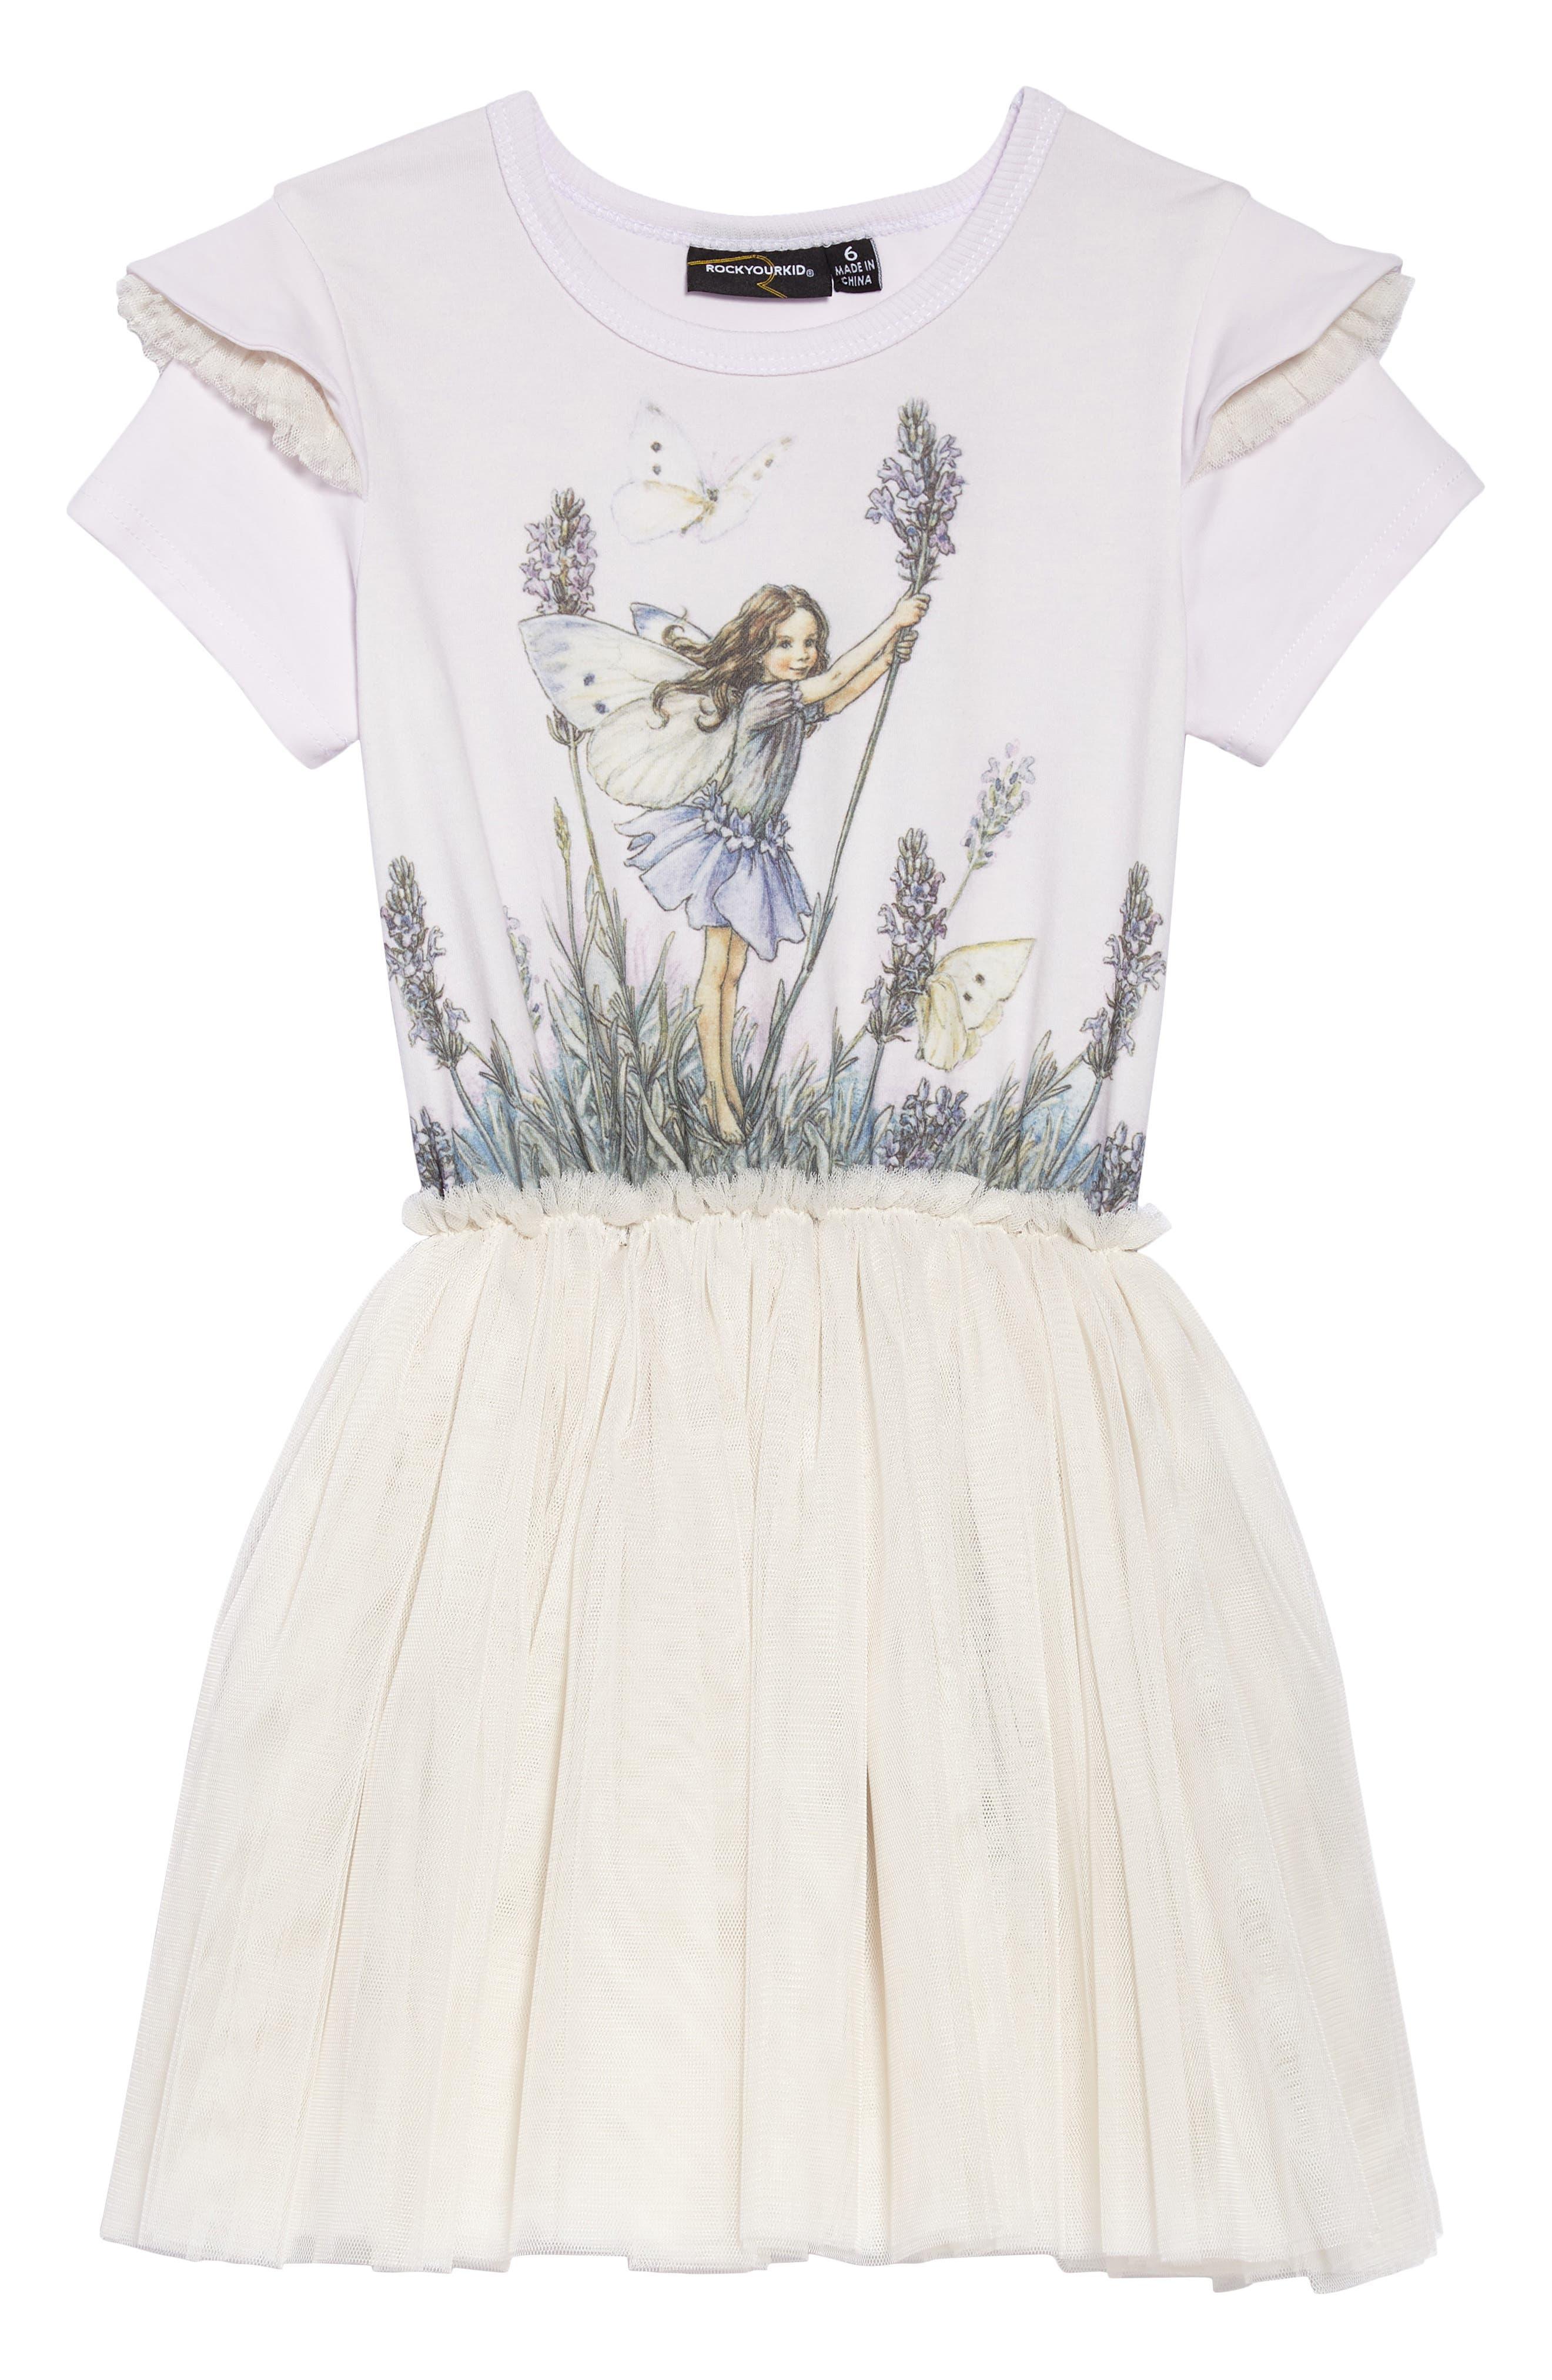 Fairy Wishes Circus Dress,                         Main,                         color, Lavendar/ Oatmeal